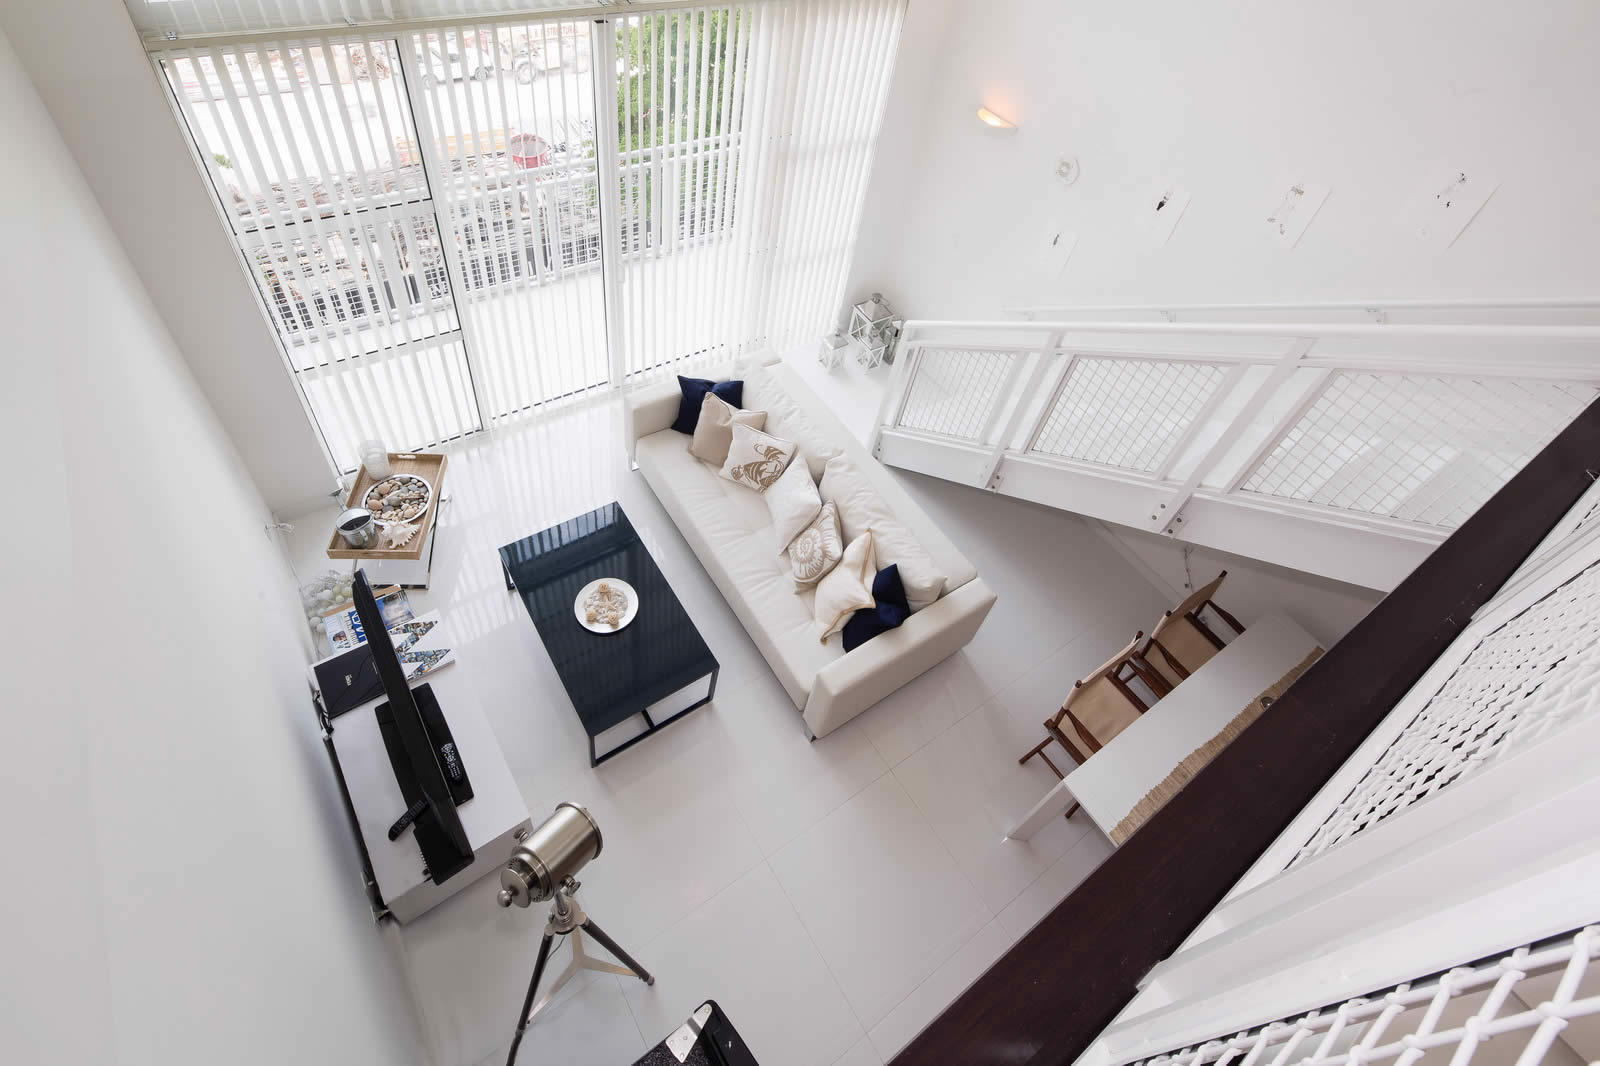 beau-duplex-3-piscines-baie-terrasse-salle-de-sport-a-vendre